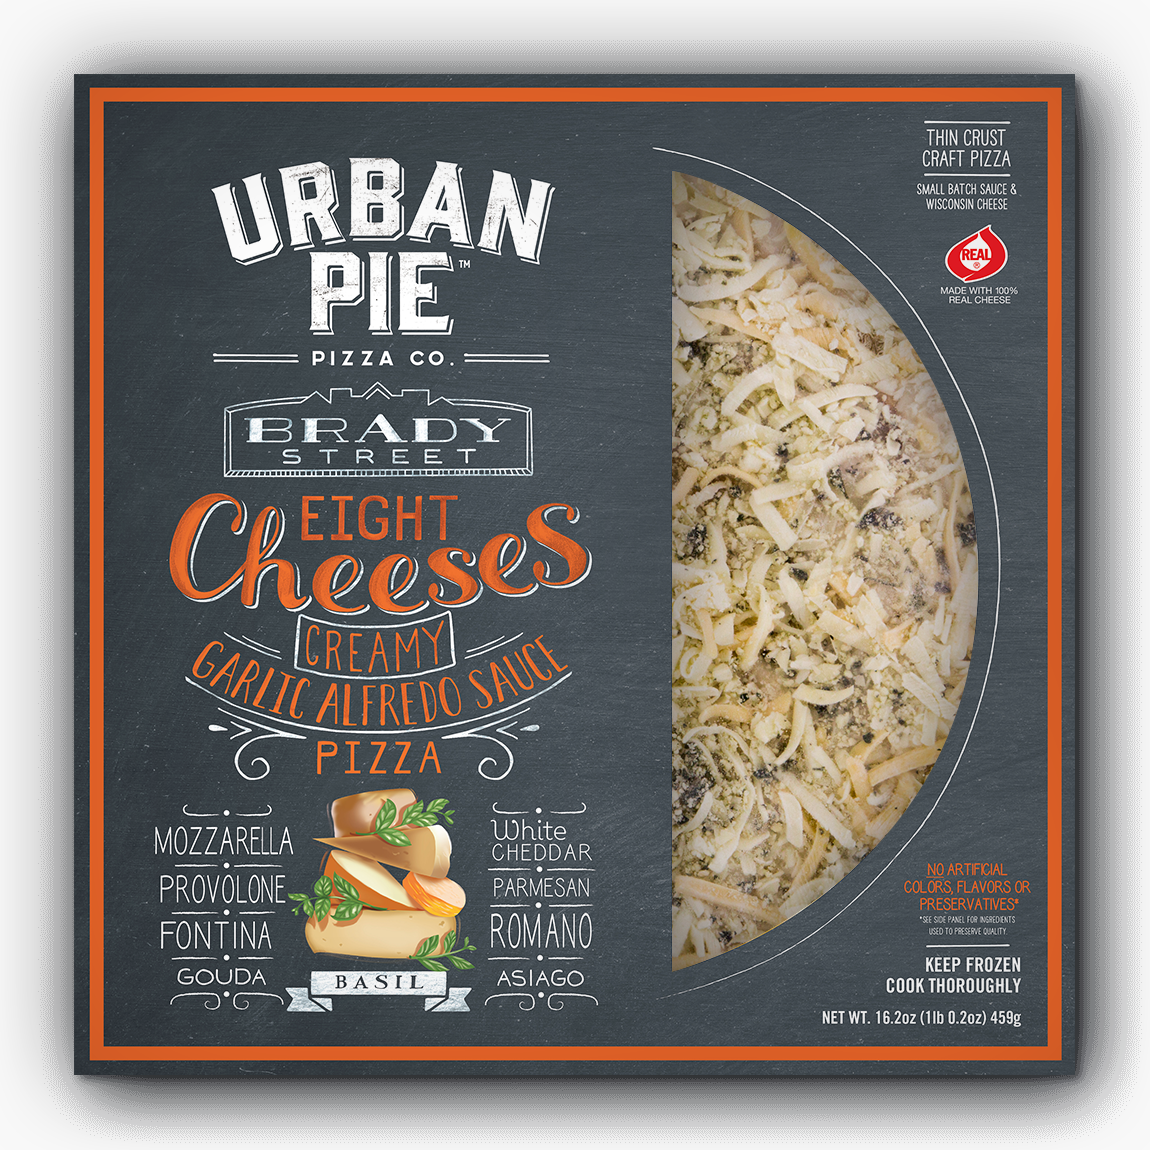 Brady Street Eight Cheese Pizza Urban Pie